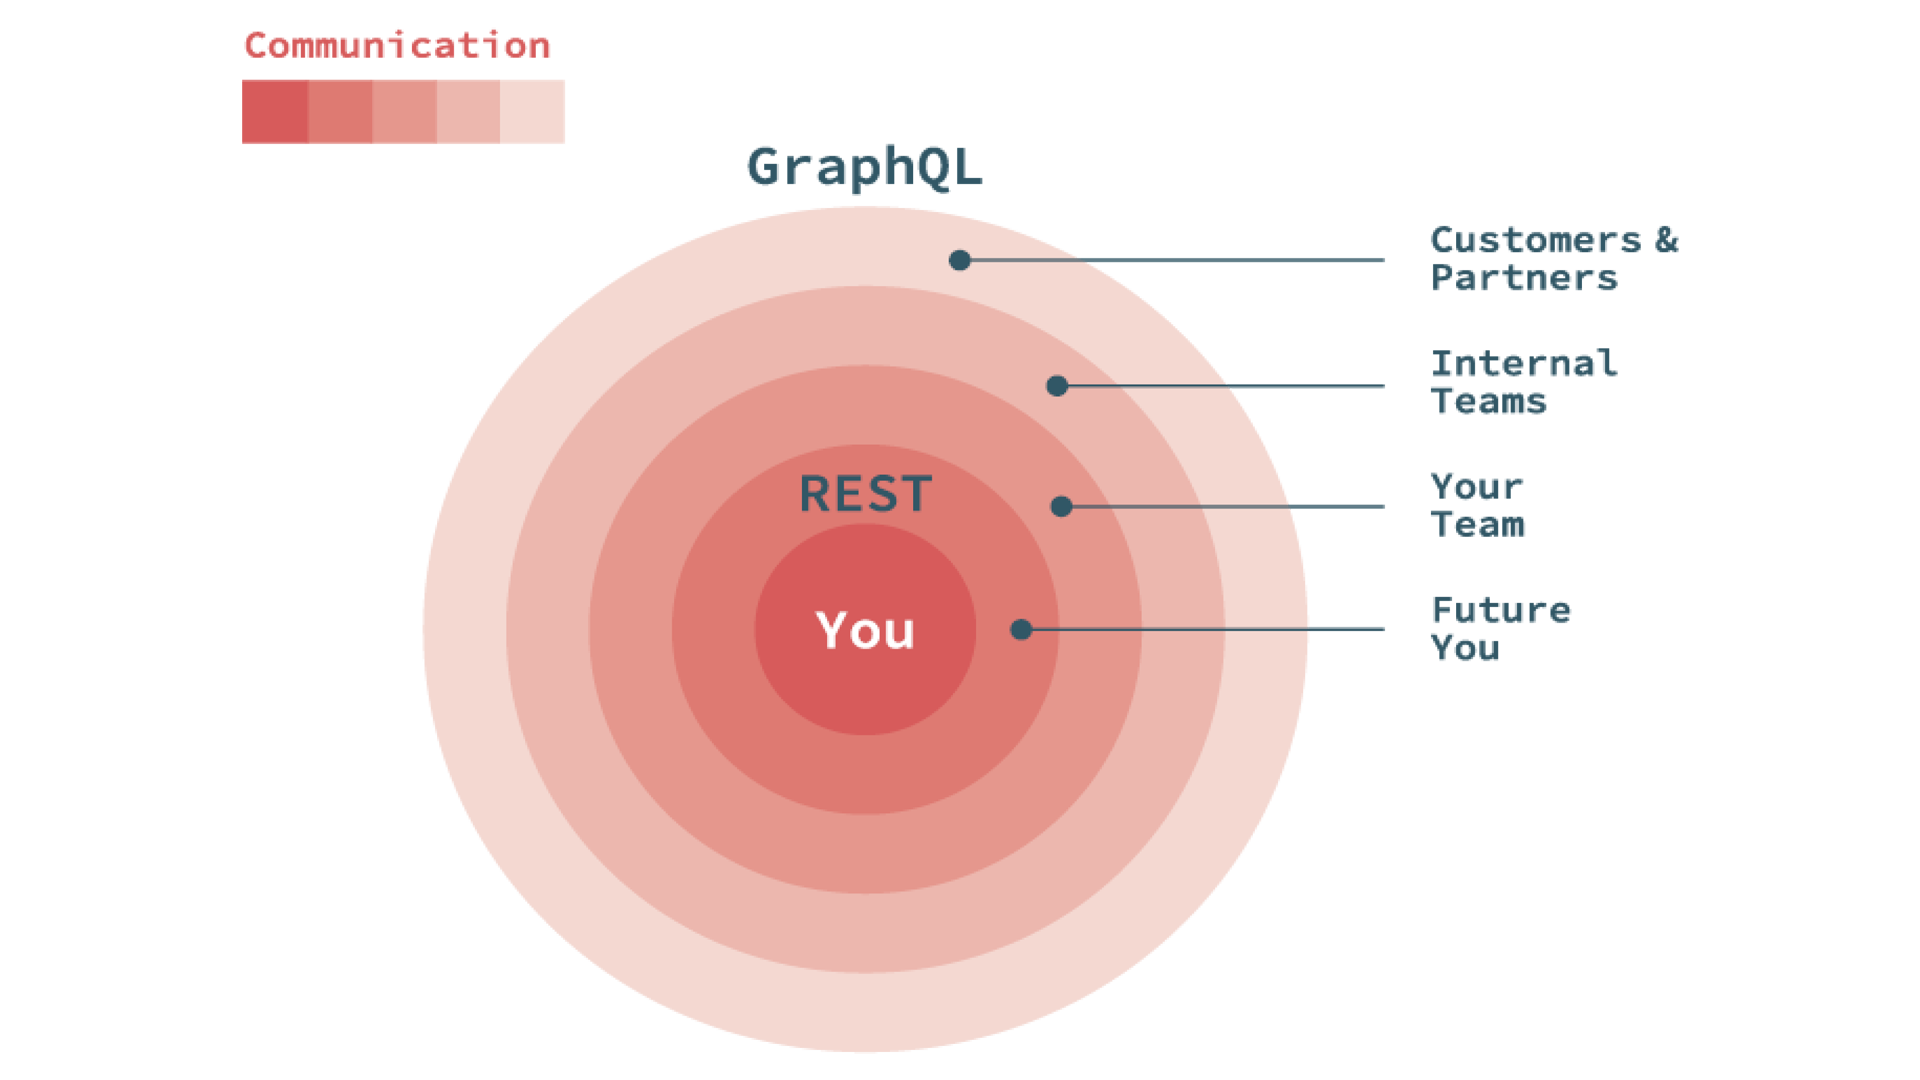 GraphQL REST Communication